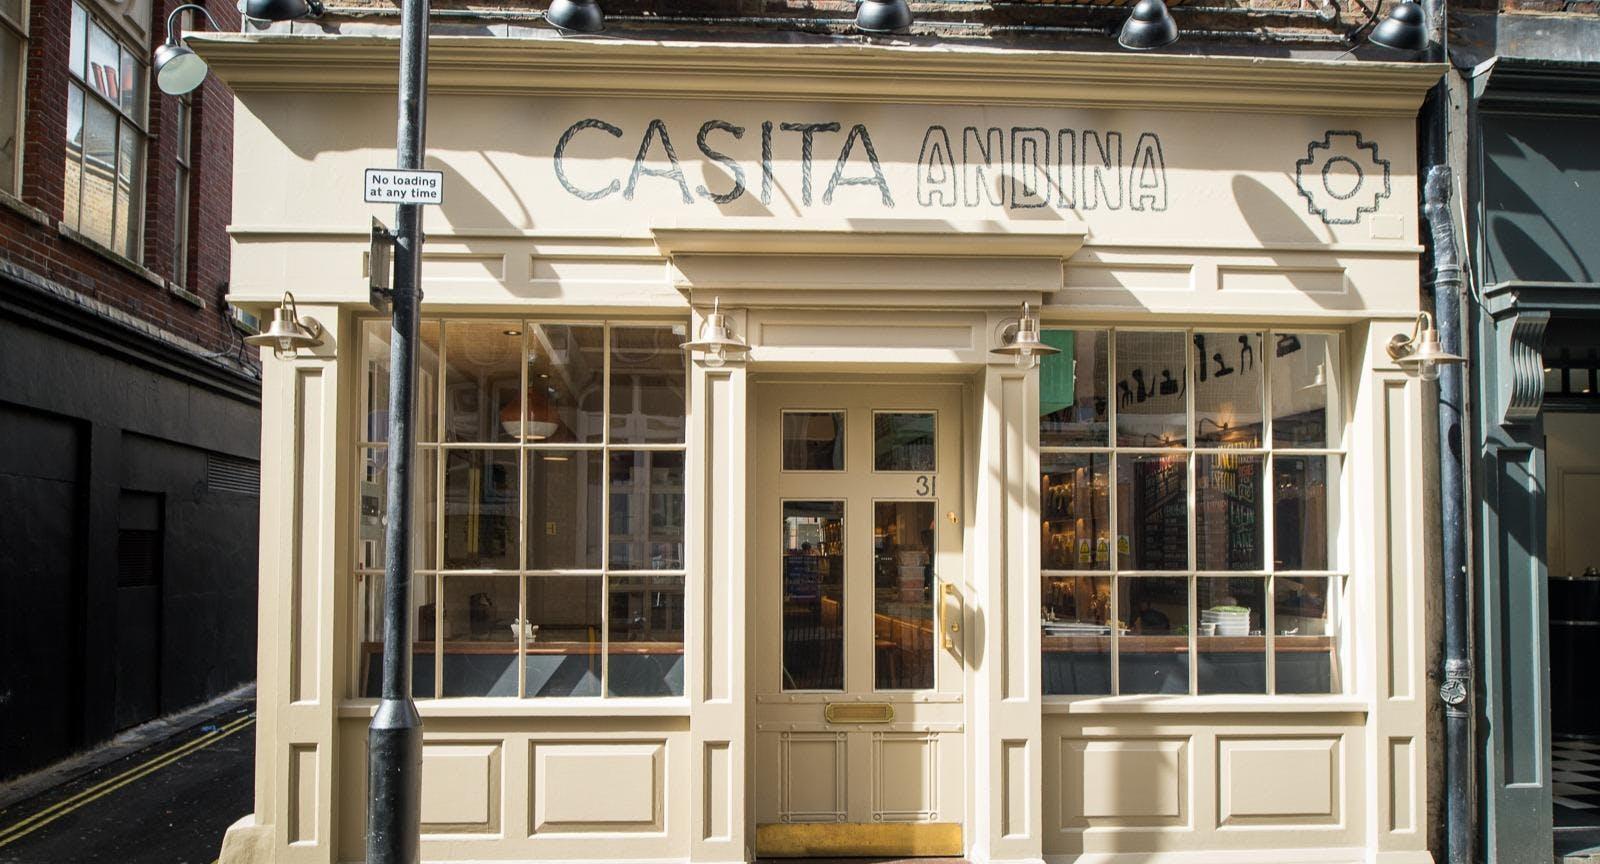 Casita Andina London image 1